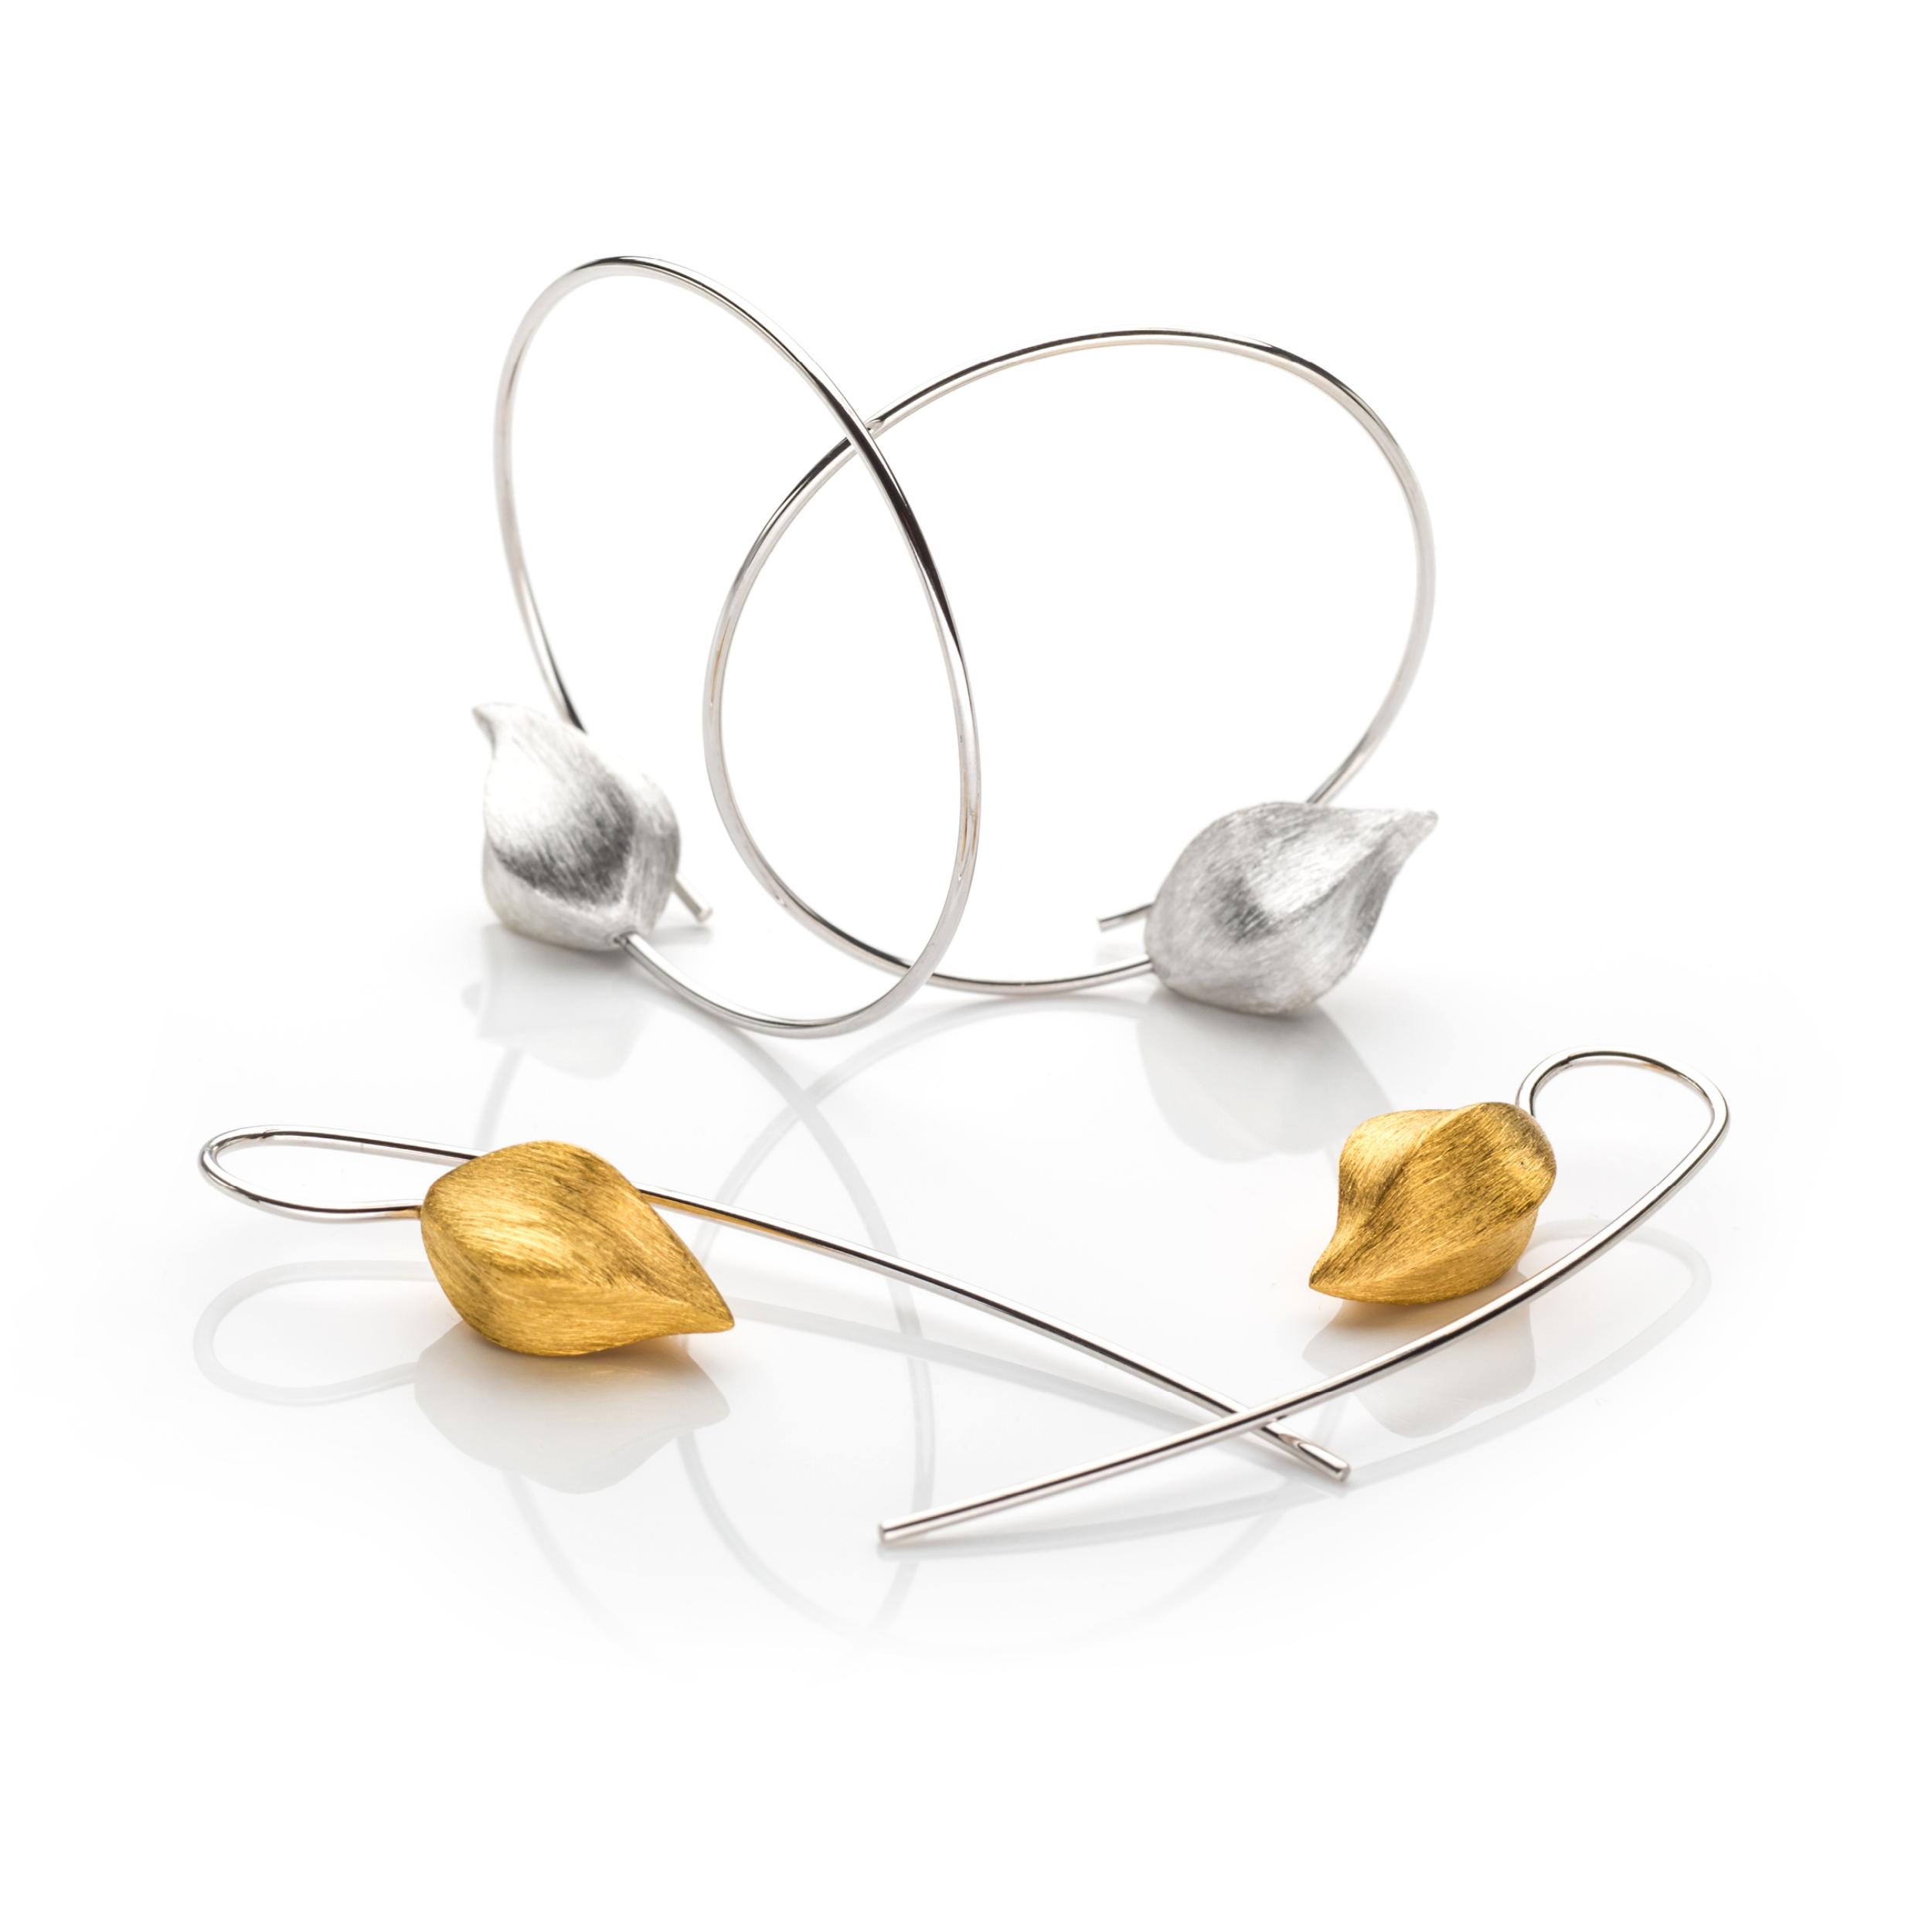 Jewellery by Lindenau - from Originals Jewellers & Gallery